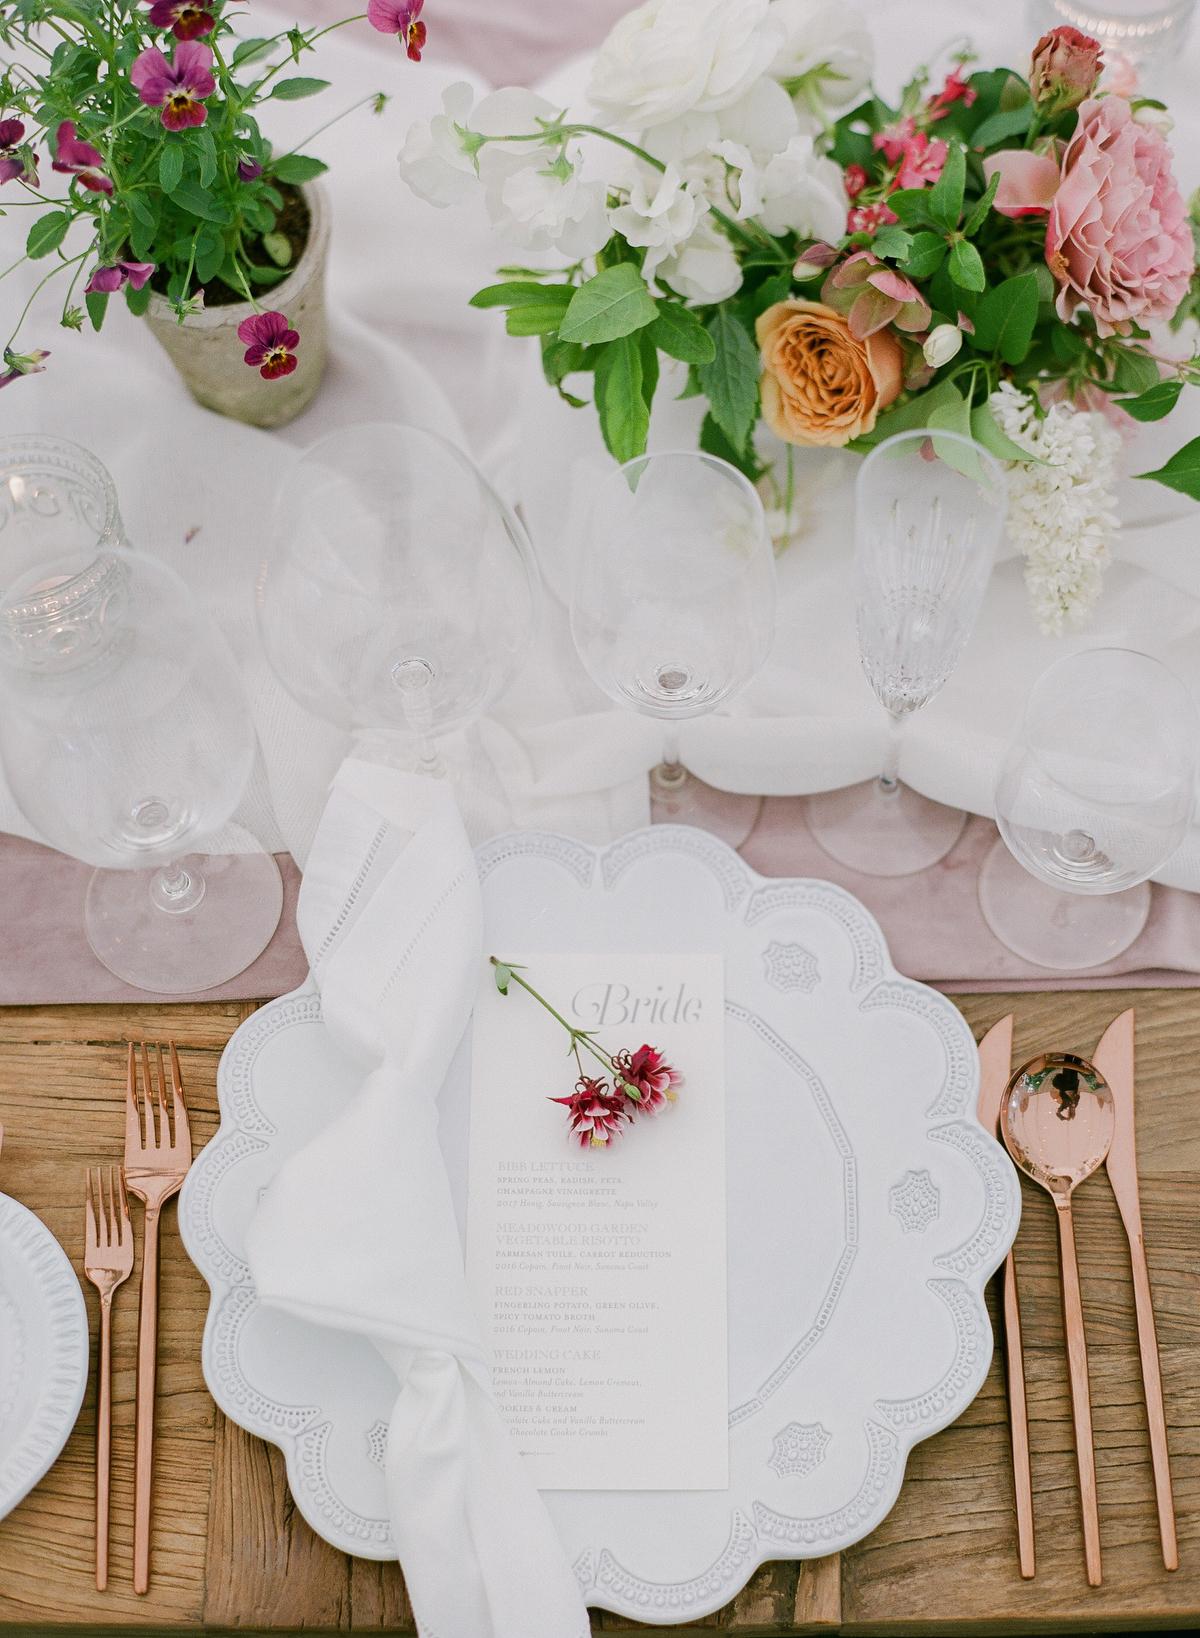 nadine dan wedding place setting